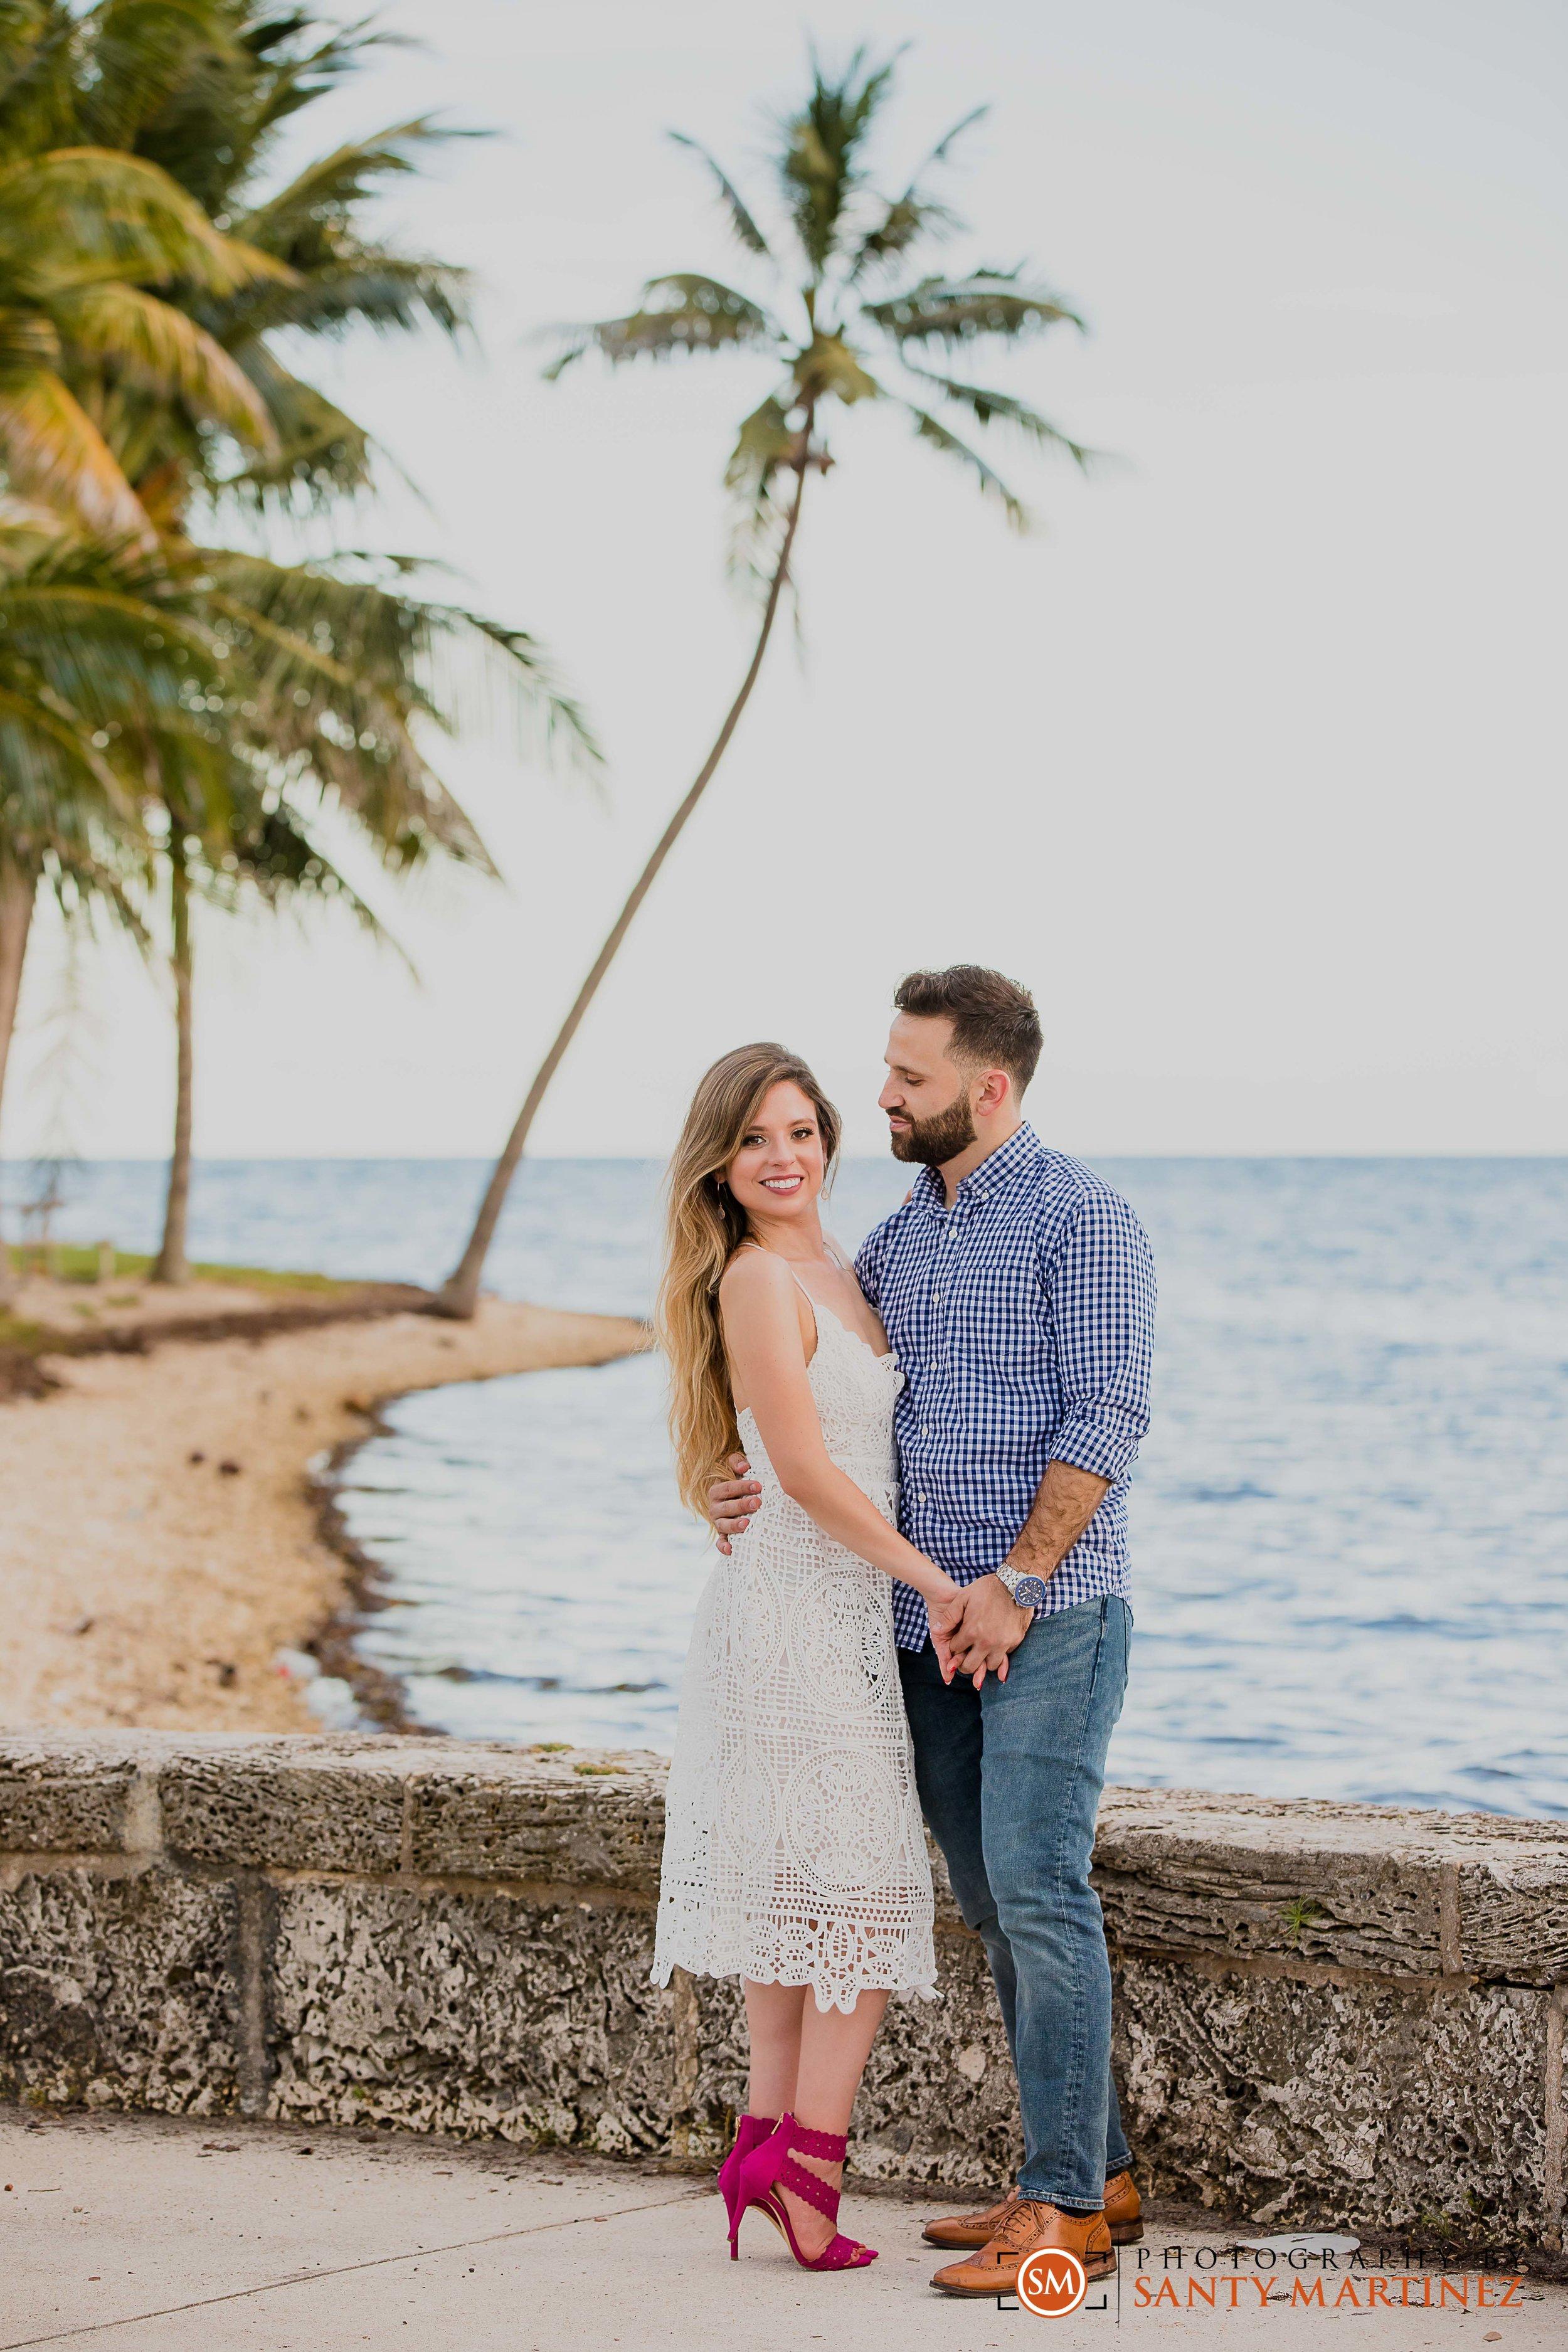 Engagement Session - Matheson Hammock Park - Santy Martinez Wedding Photographer-17.jpg